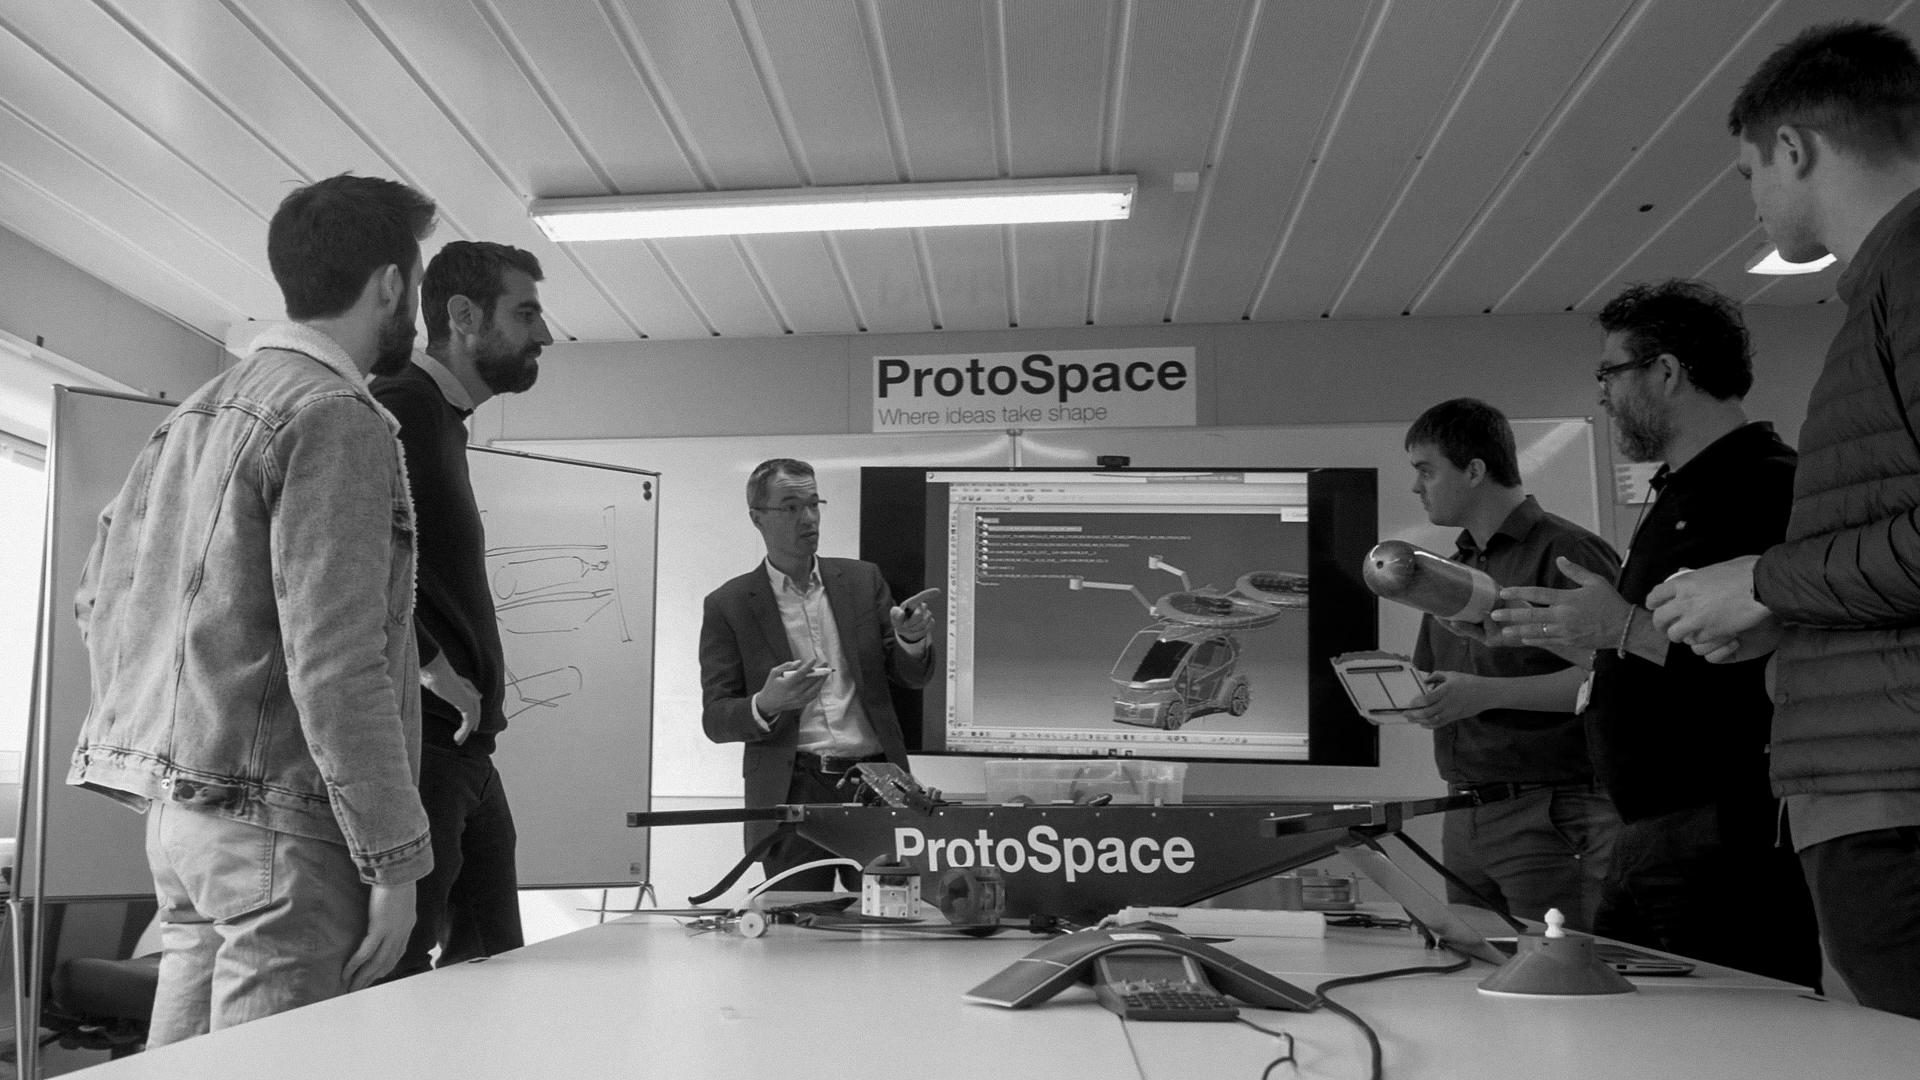 protospace image 1.jpg